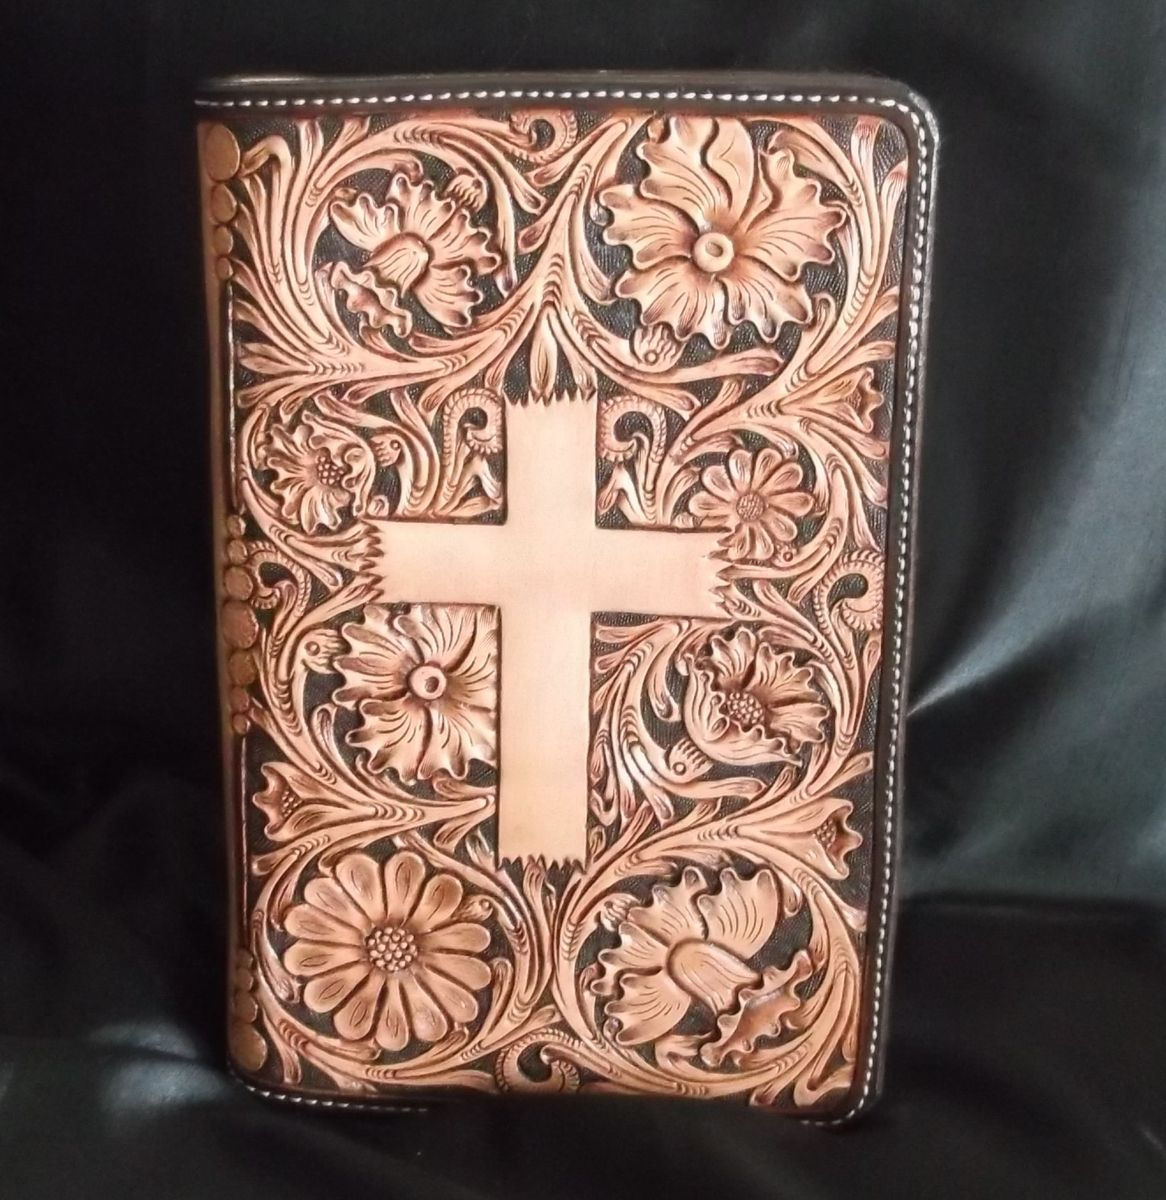 Handmade Custom Leather Bible Covers By Double U